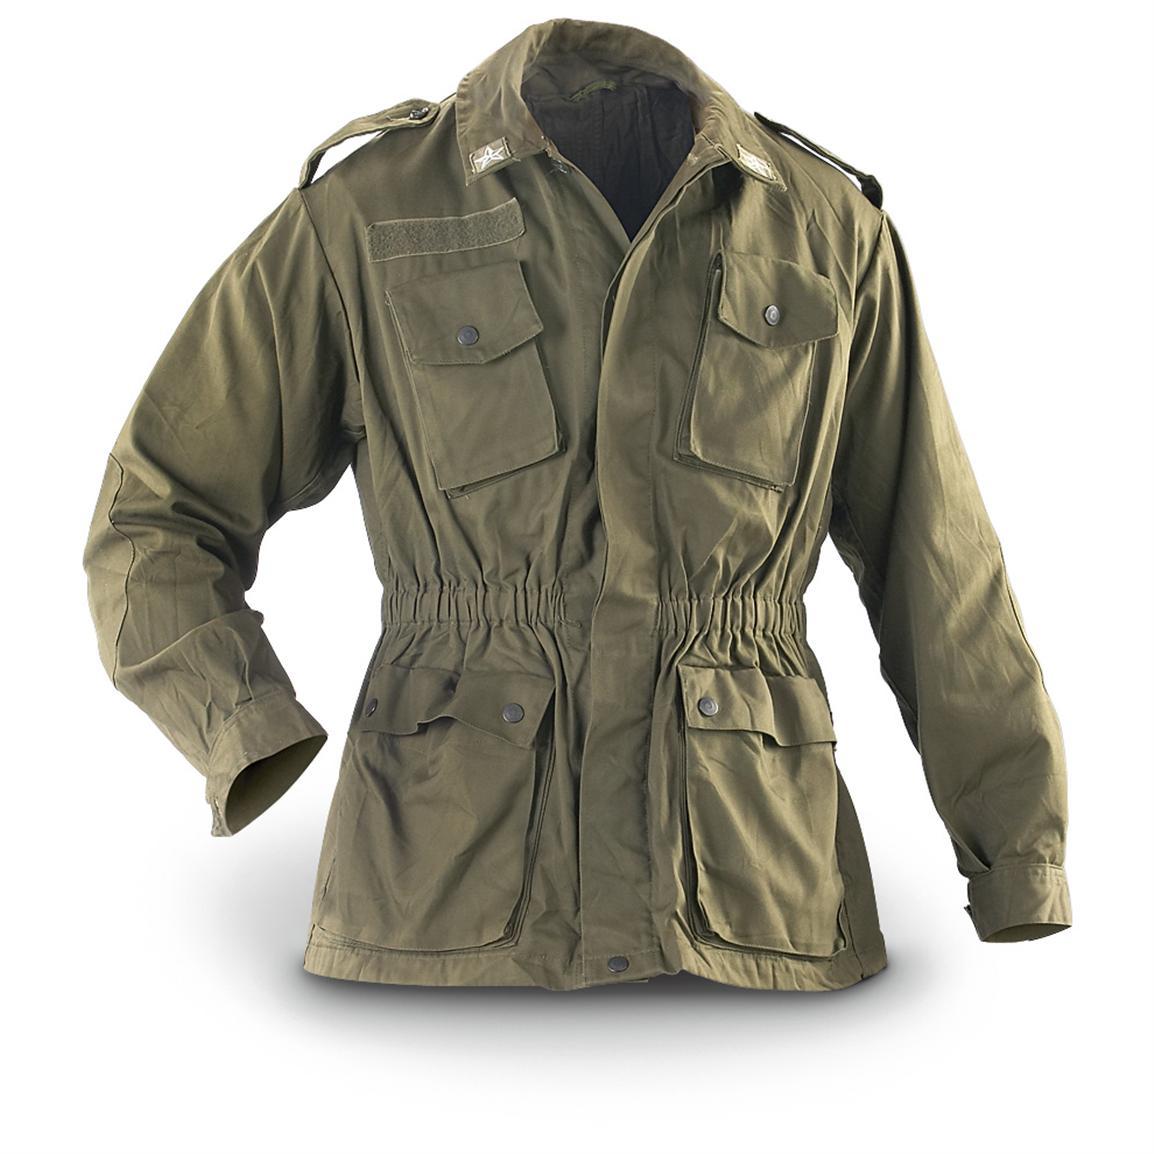 military jackets 2 used italian military combat jackets, olive drab fykewdi